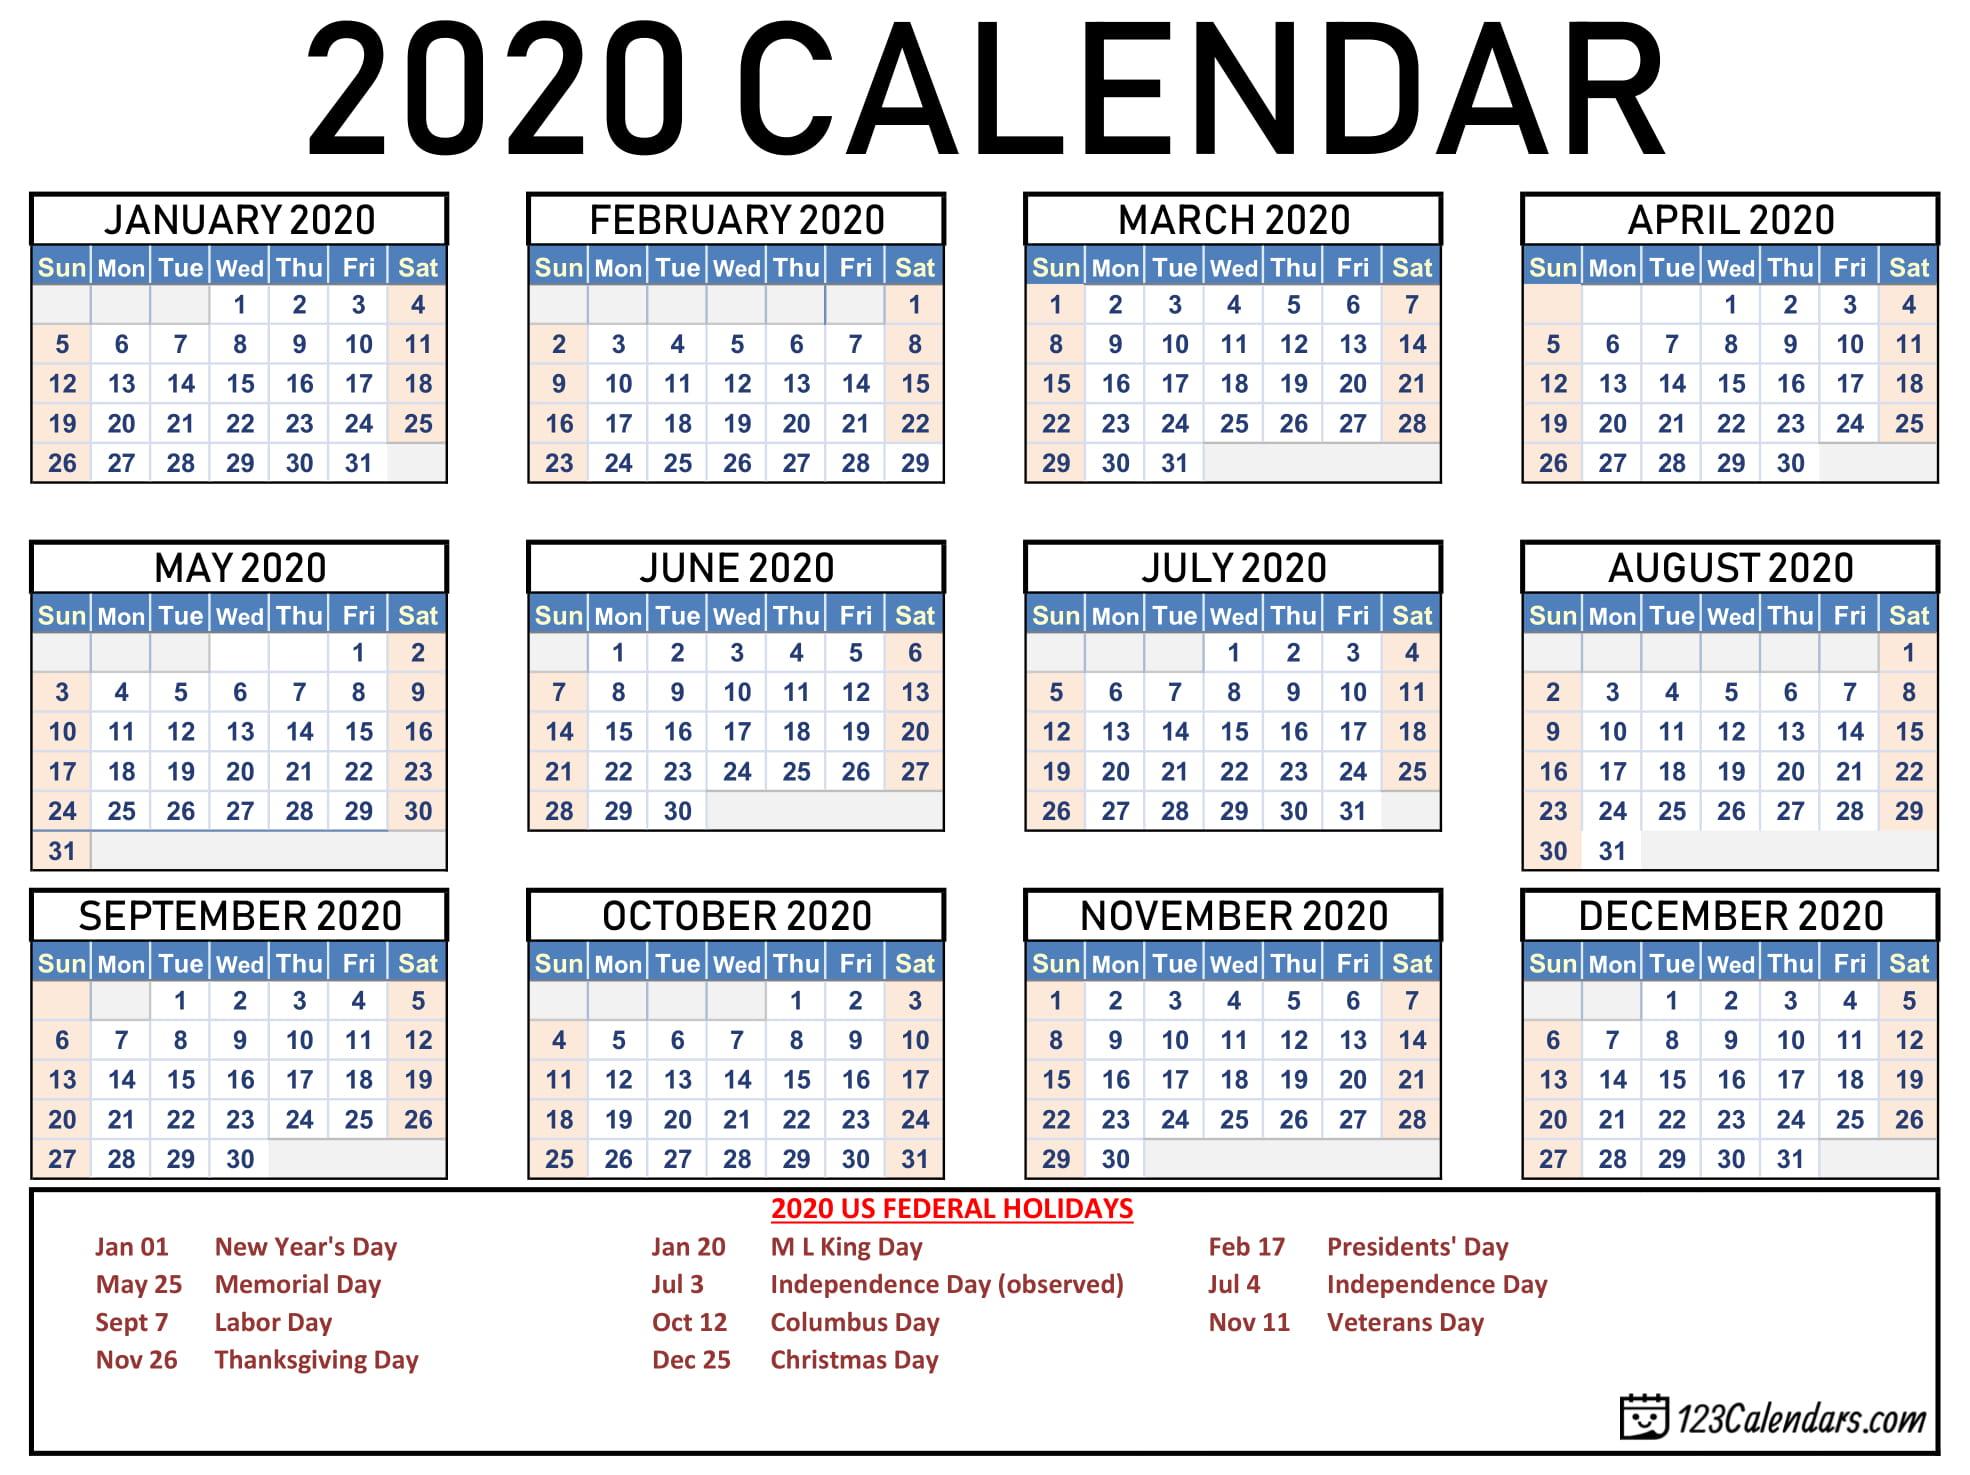 Free Printable 2020 Calendar | 123Calendars throughout Pocket Size Calendar Printable